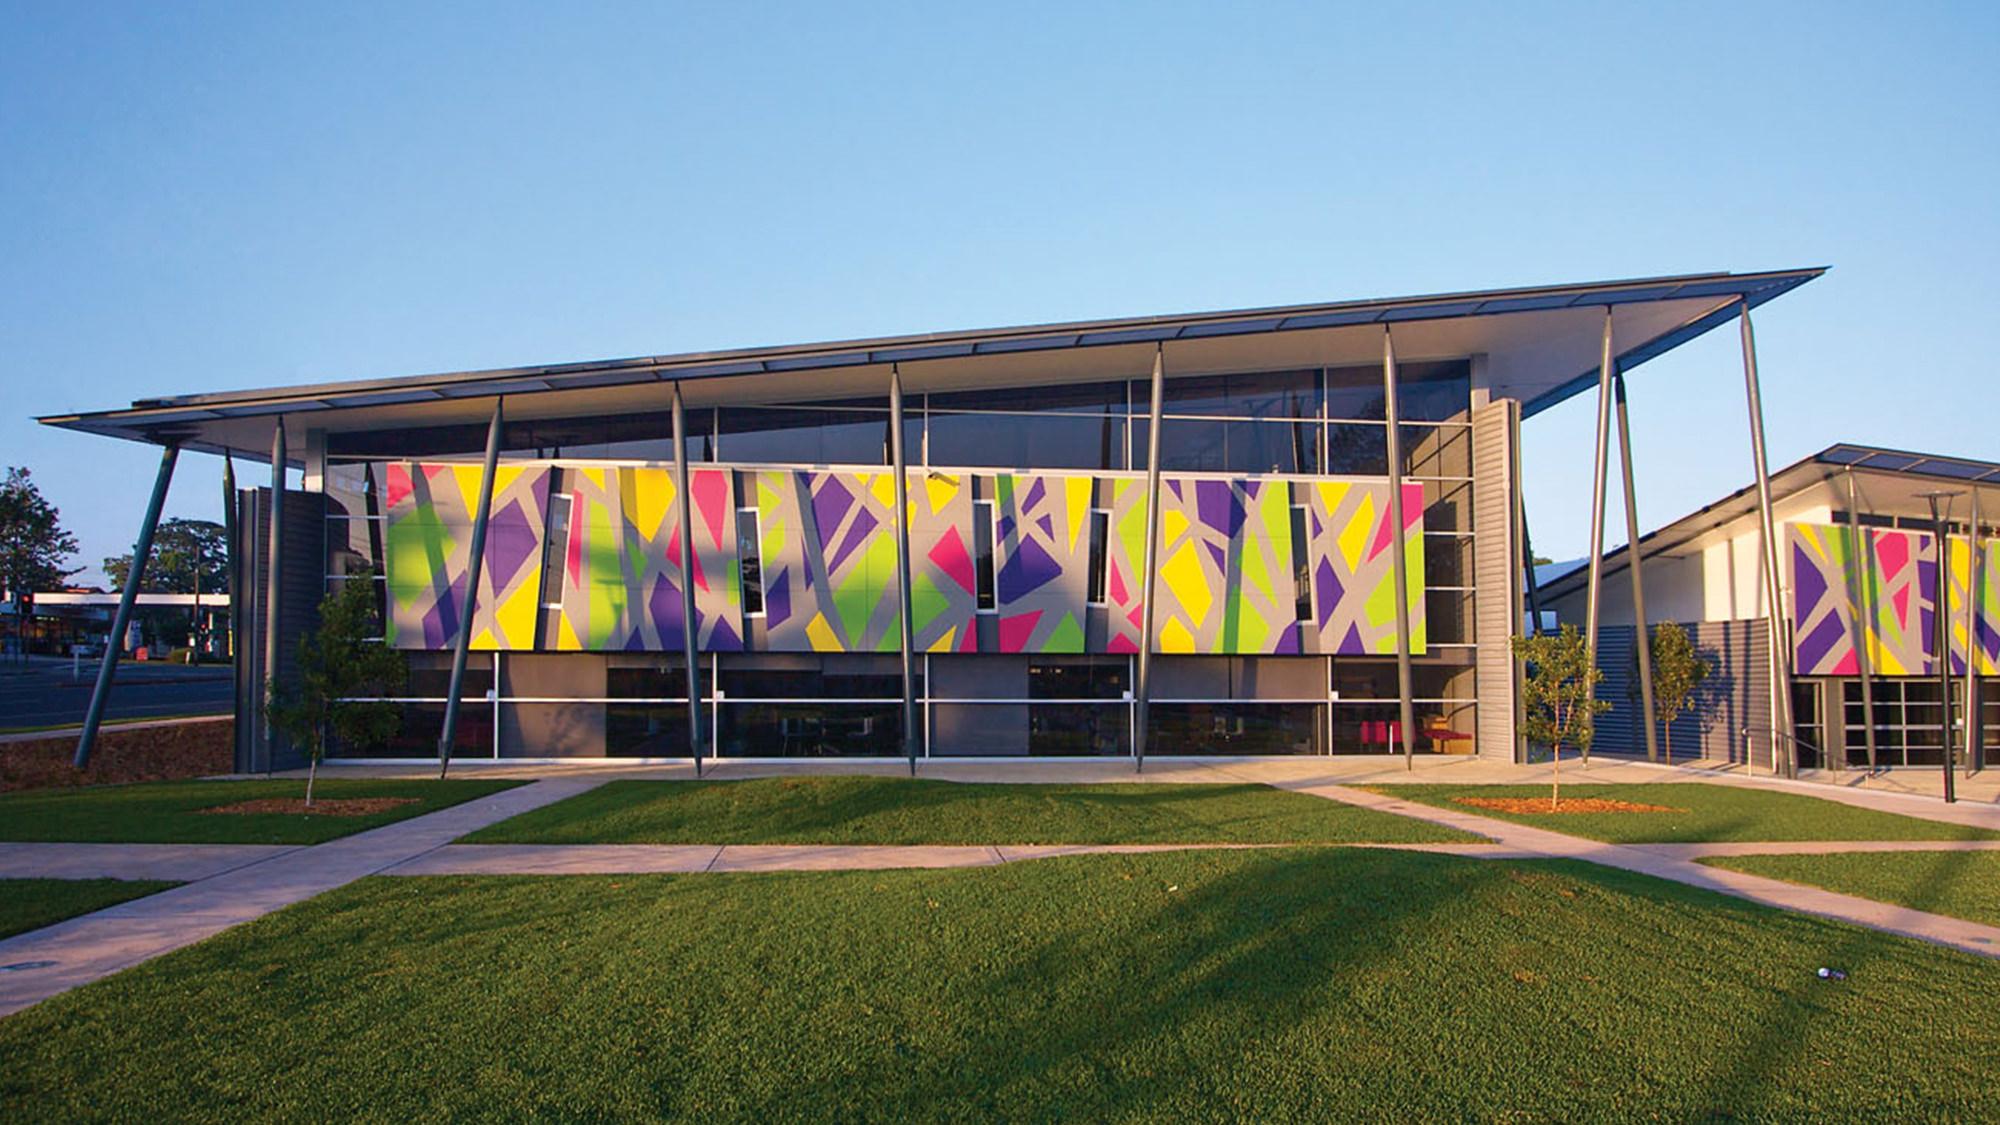 ingleburn-library-community-centre-project-image